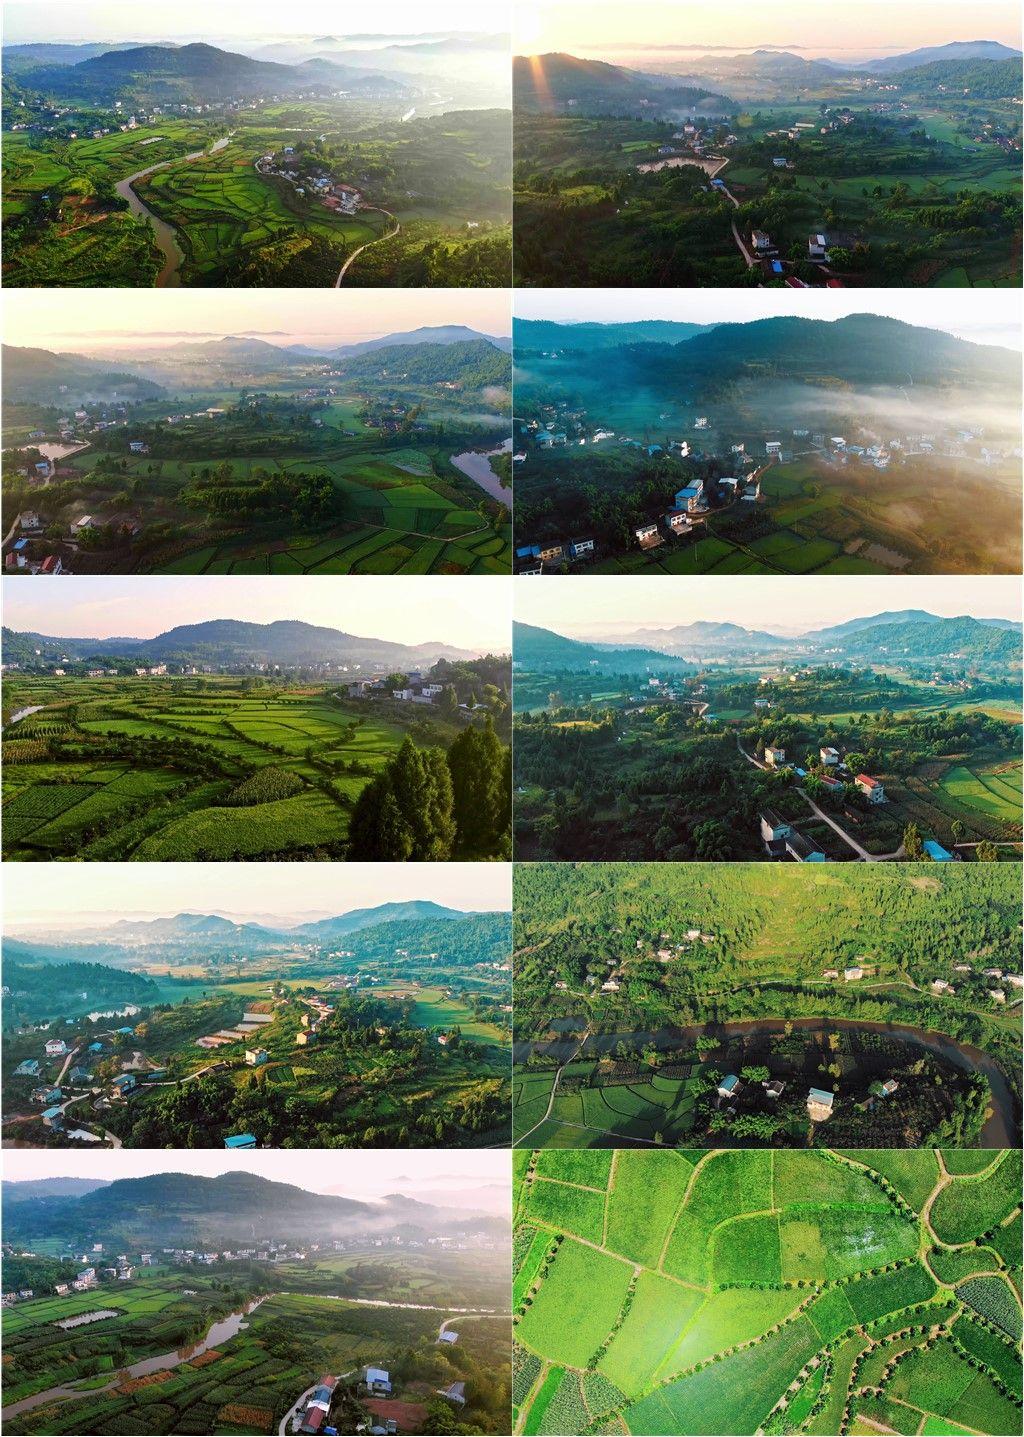 航拍乡村田园风光丨4K丨原创实拍